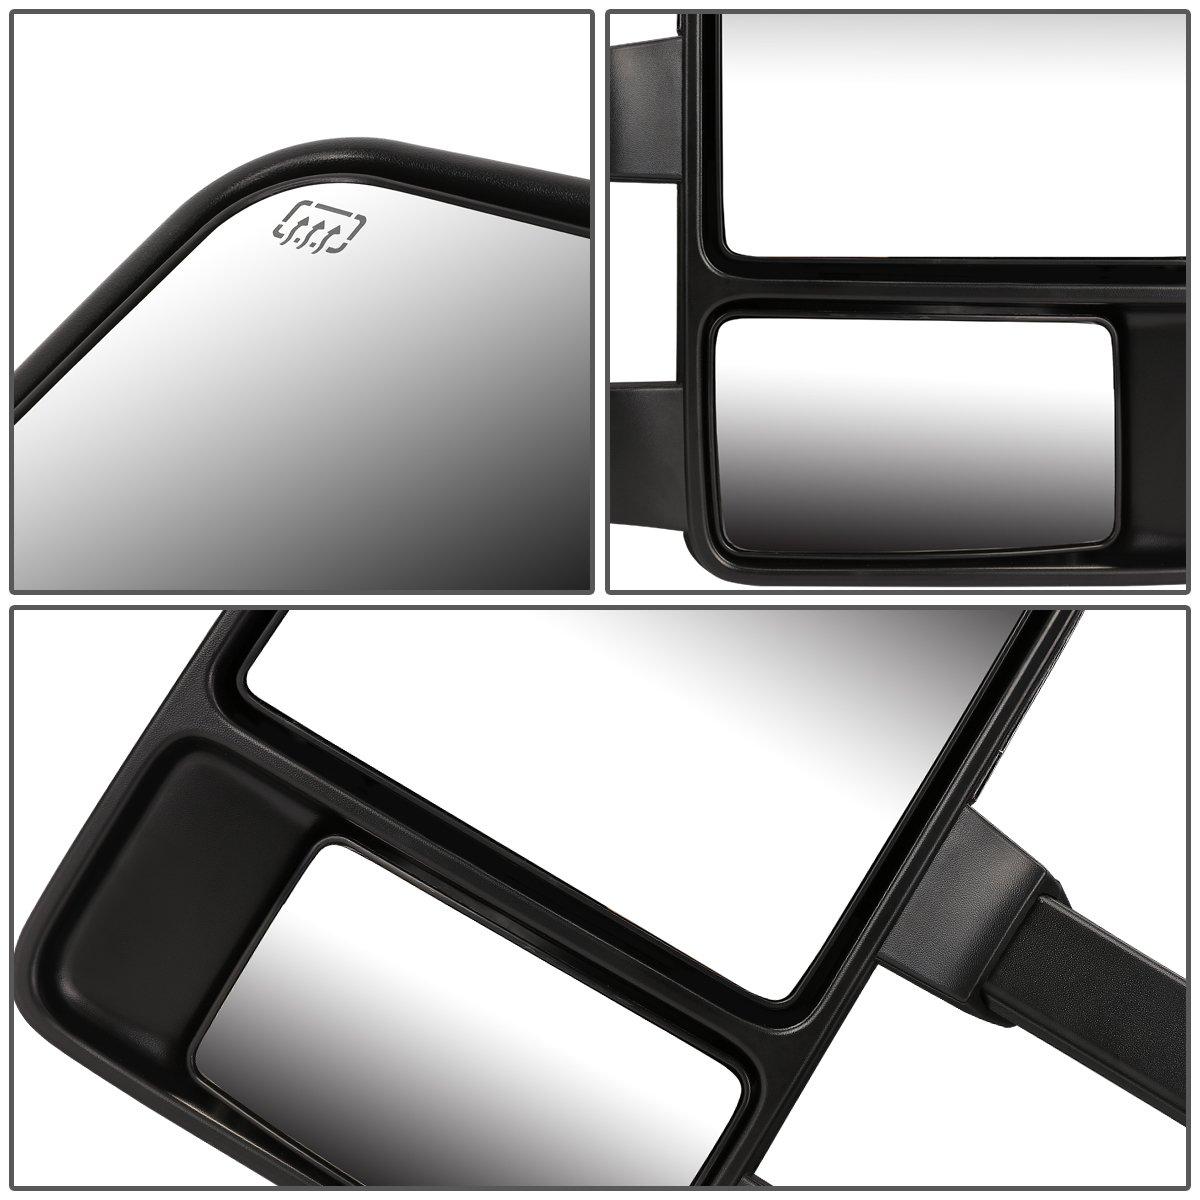 GGBAILEY D3296A-F1A-BK-LP Custom Fit Car Mats for 2003 Isuzu Ascender Black Loop Driver /& Passenger Floor